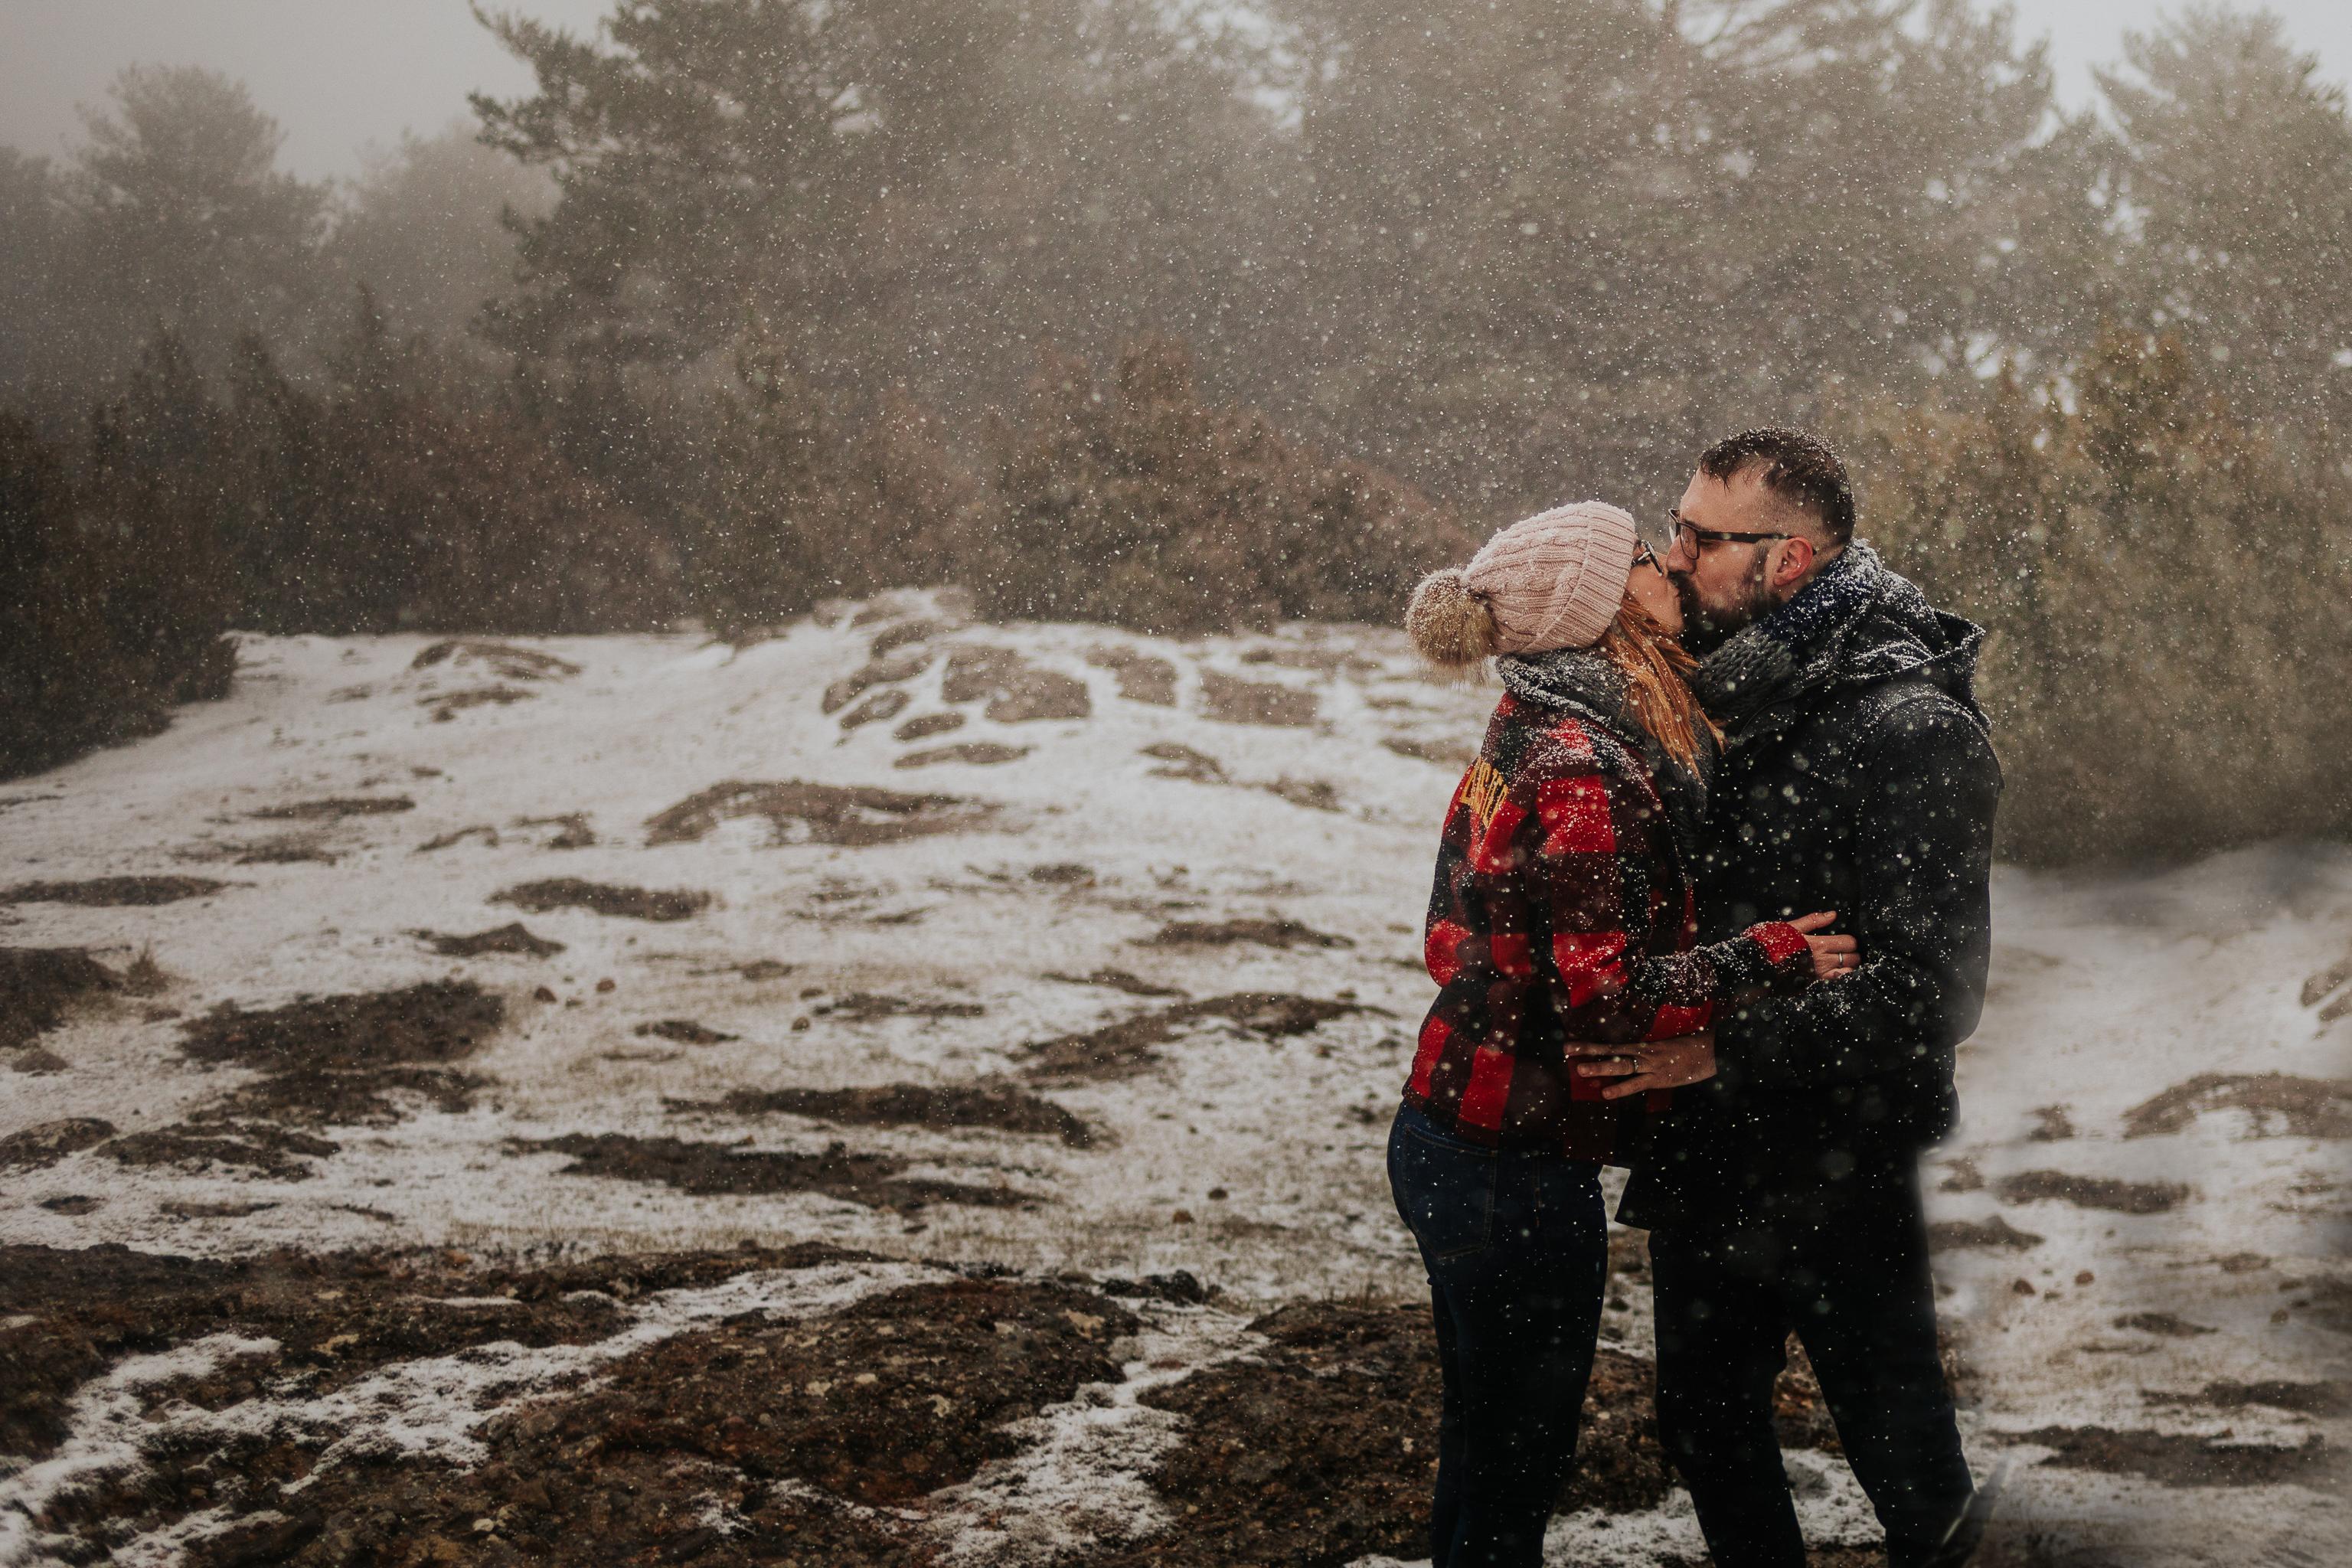 fotógrafo de pareja barcelona :: preboda nieve :: reportaje de pareja en la nieve :: fotógrafo de preboda :: fotógrafo boda barcelona :: barcelona wedding photographer :: destination wedding photographer :: girona wedding photographer :: save the date in the snow